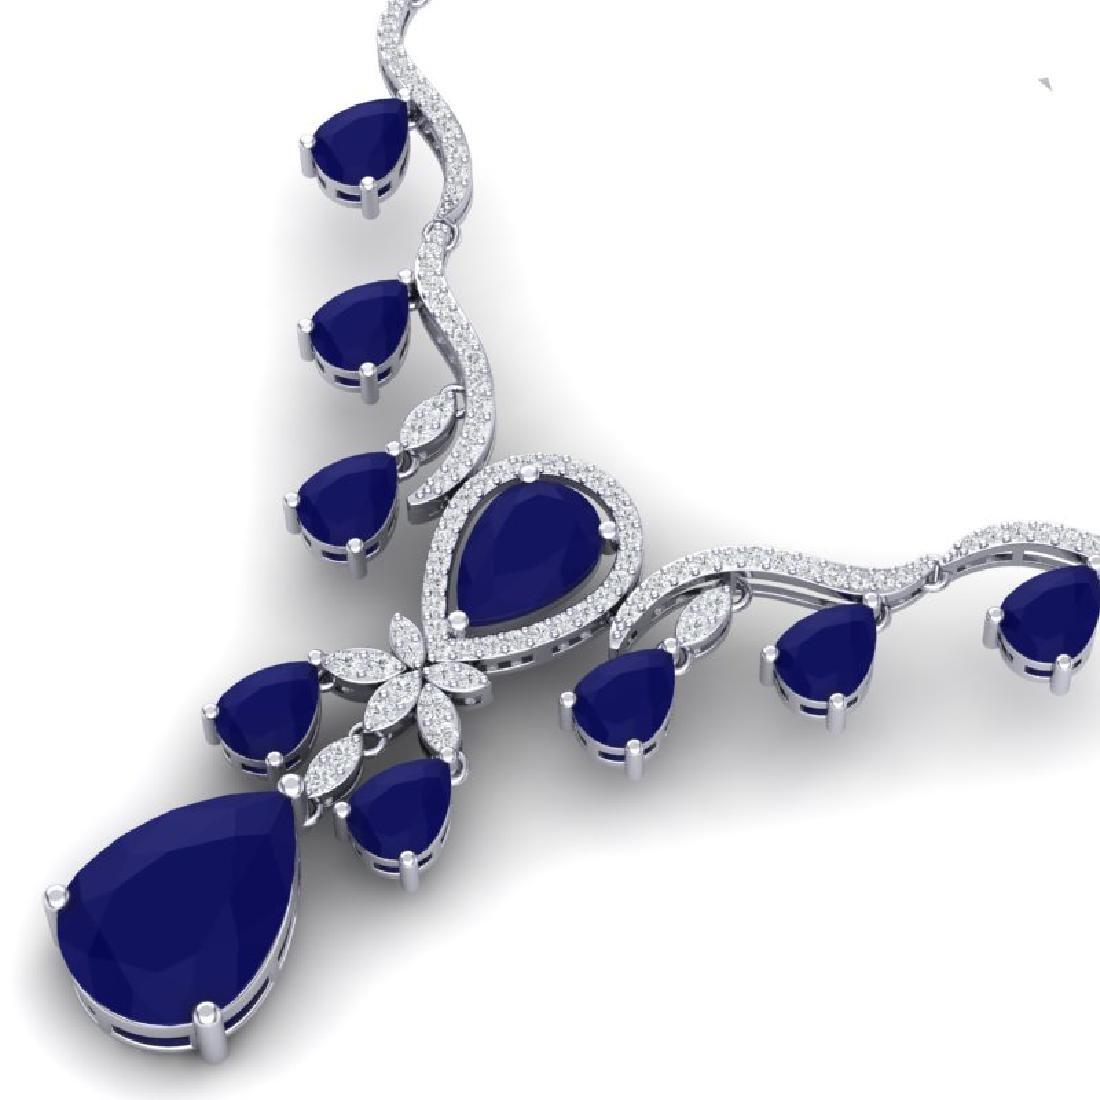 36.14 CTW Royalty Sapphire & VS Diamond Necklace 18K - 2